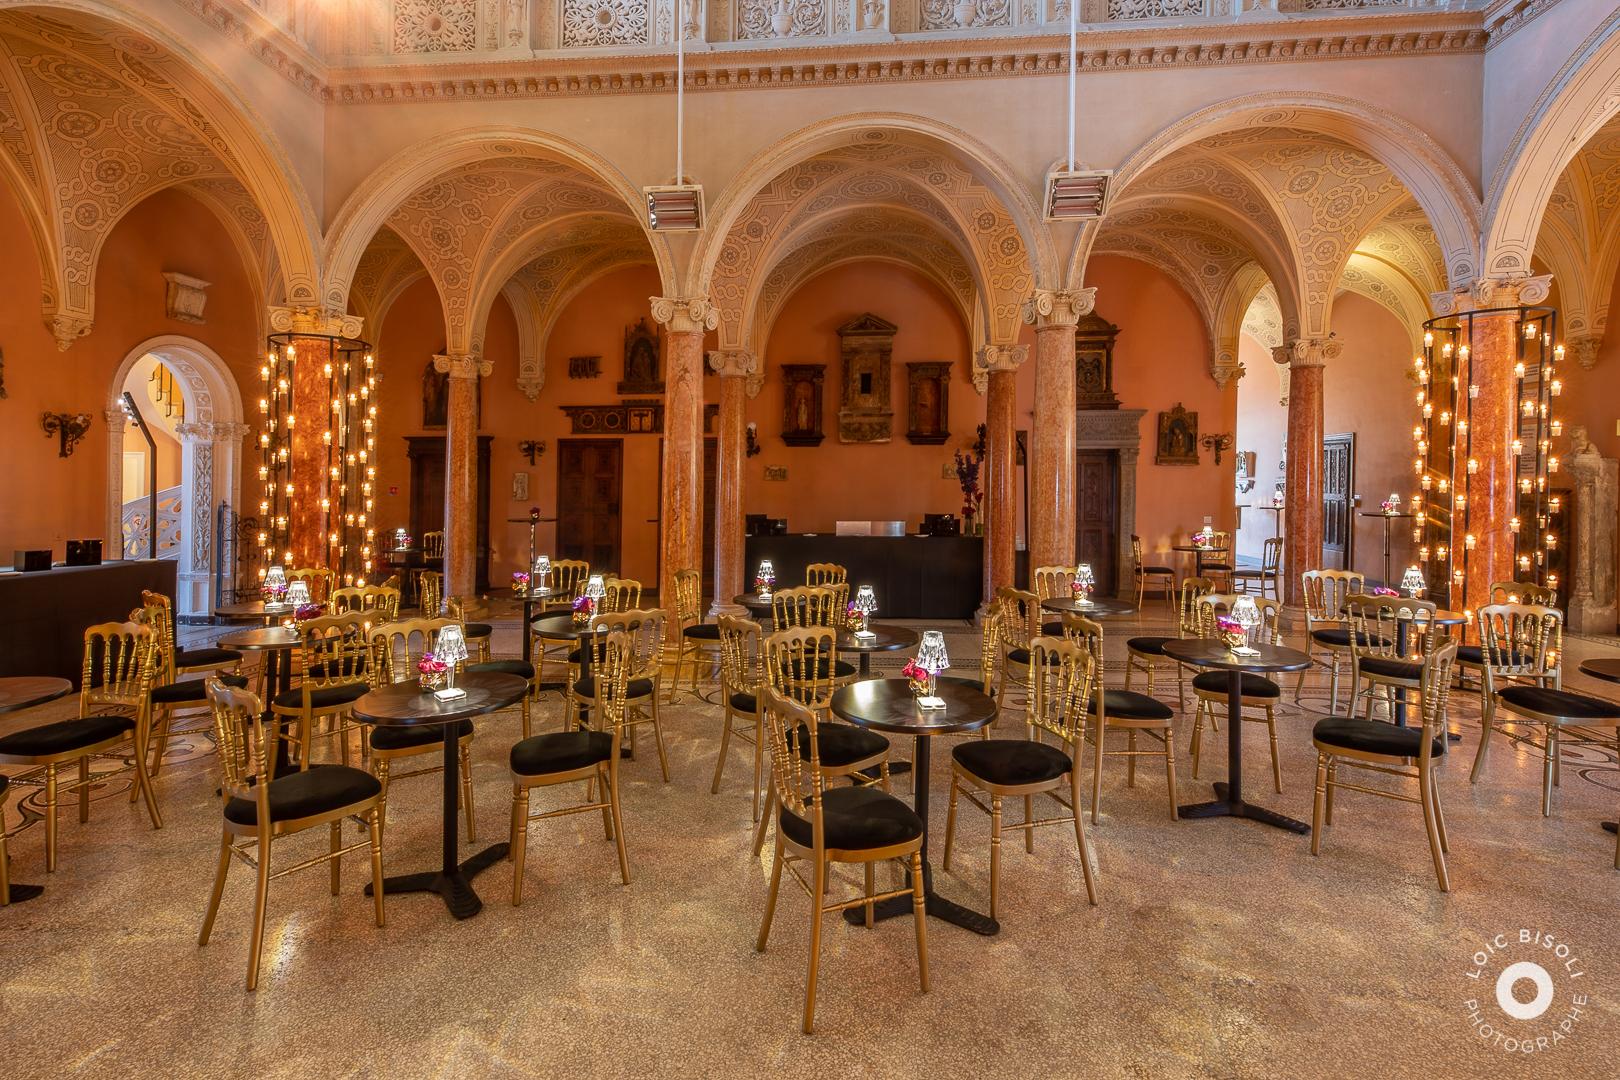 aucop-soirée-event-Villa Ephrussi de Rothschild-Studio Loic Bisoli-evenement-lumieres